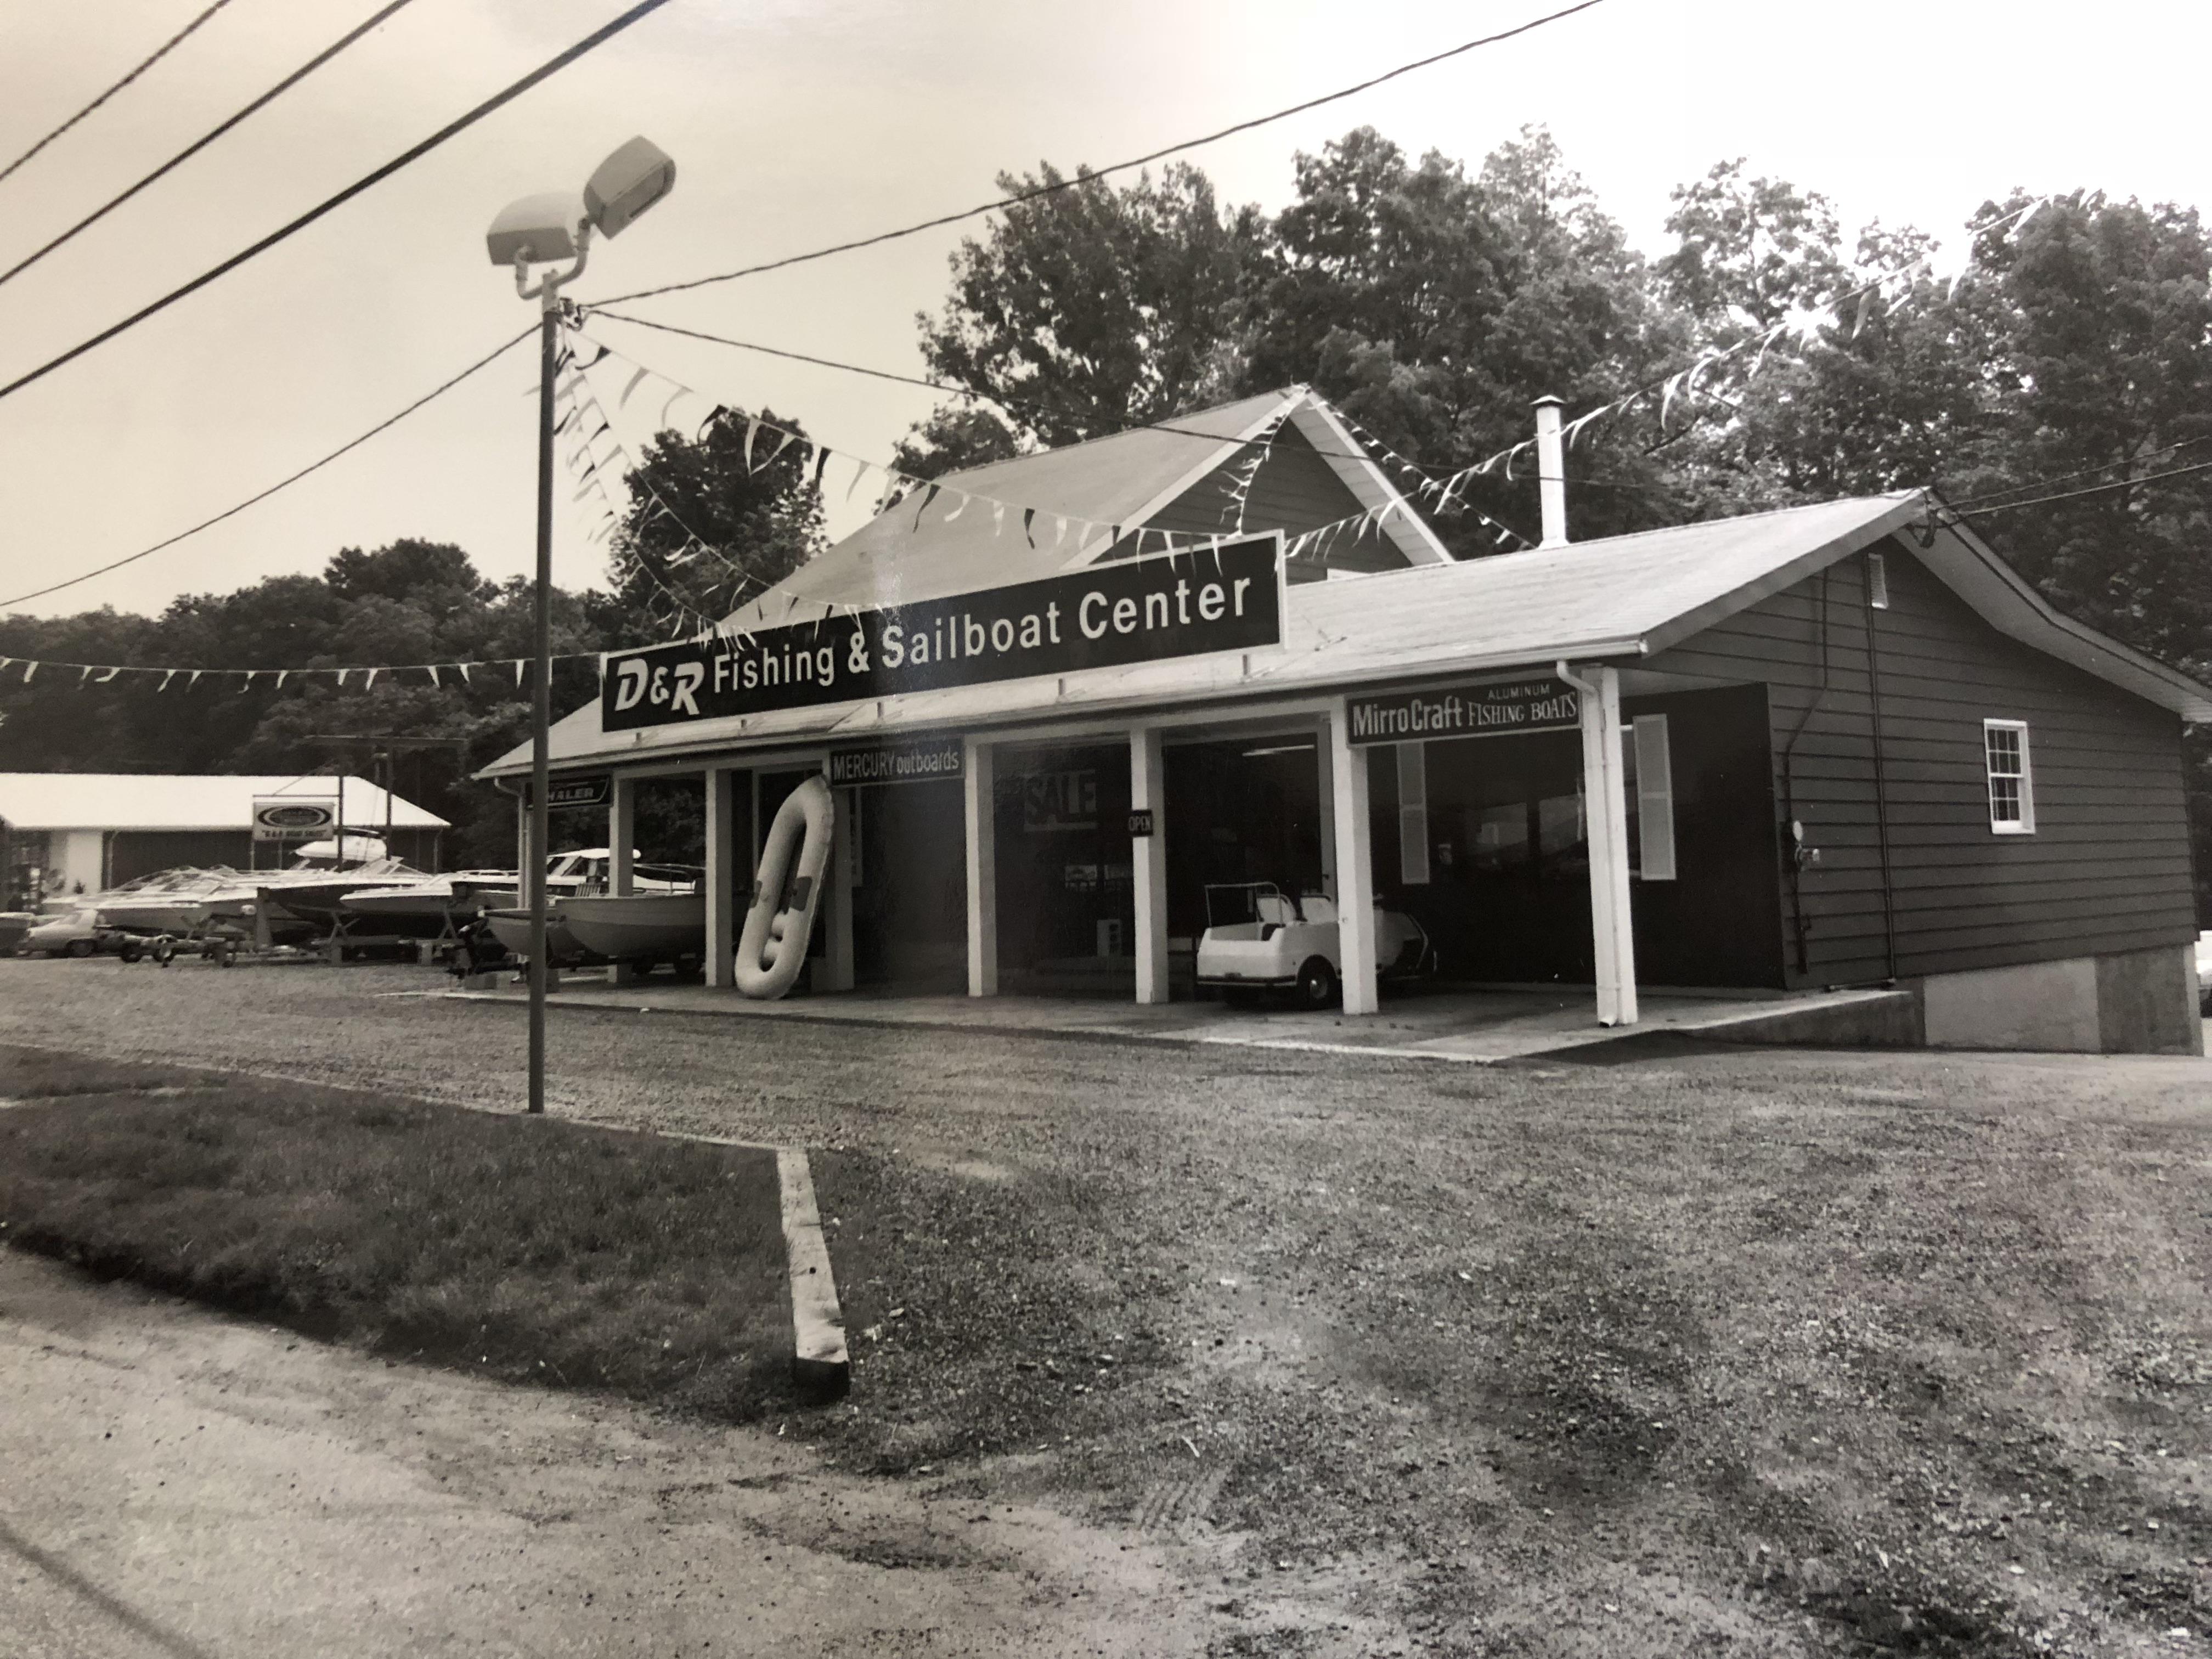 Original D&R Fishing & Sailboat Center